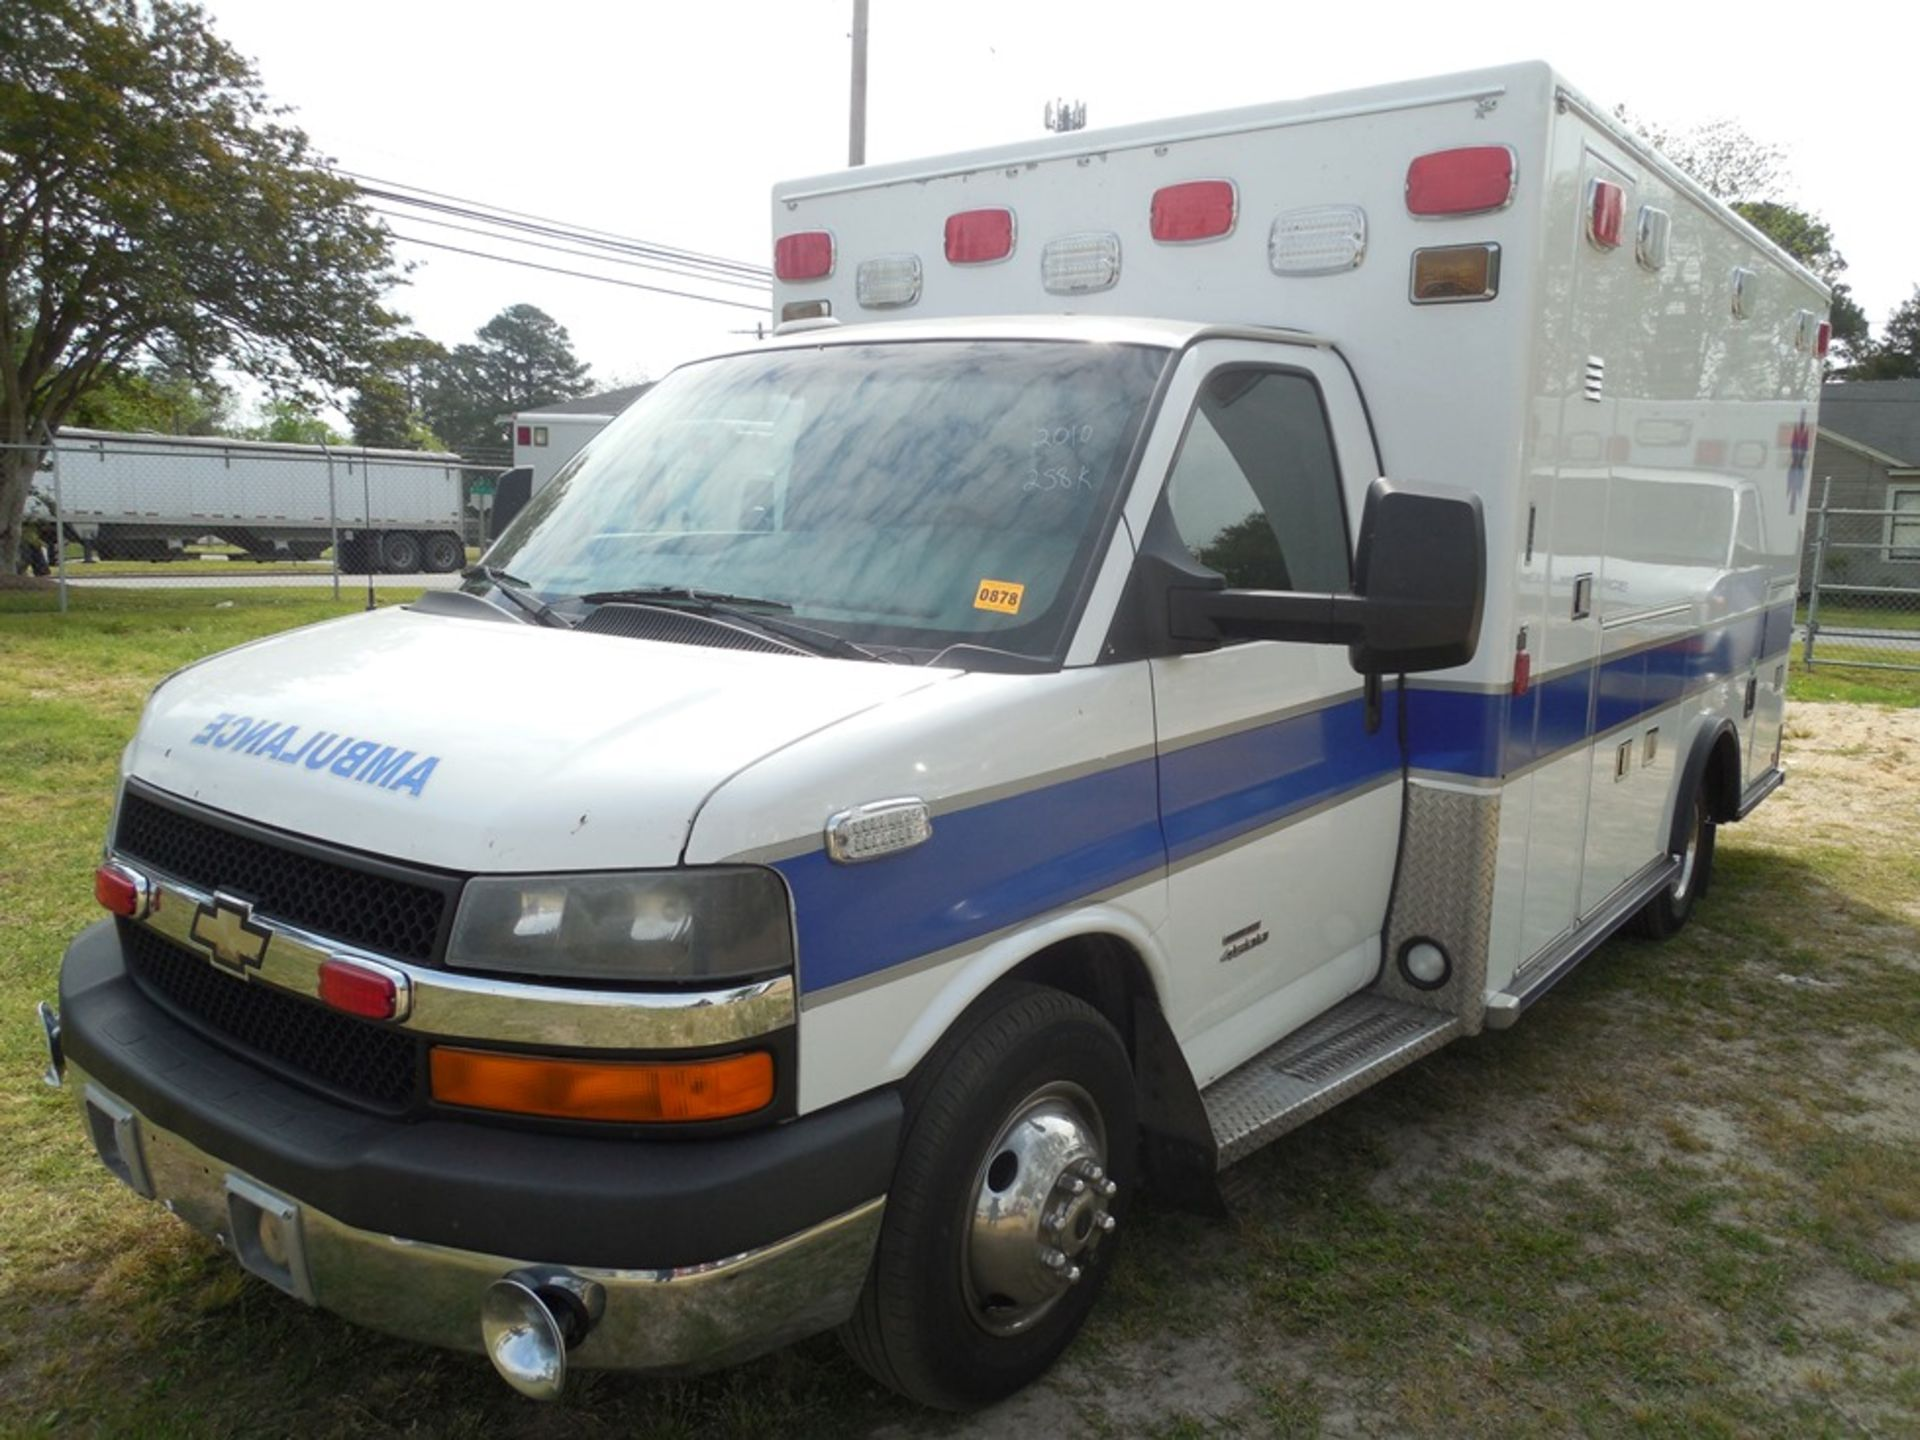 2010 Chev 4500 dsl box ambulance 258,589 miles, vin# 1GB9G5B6XA1132748 - Image 2 of 6